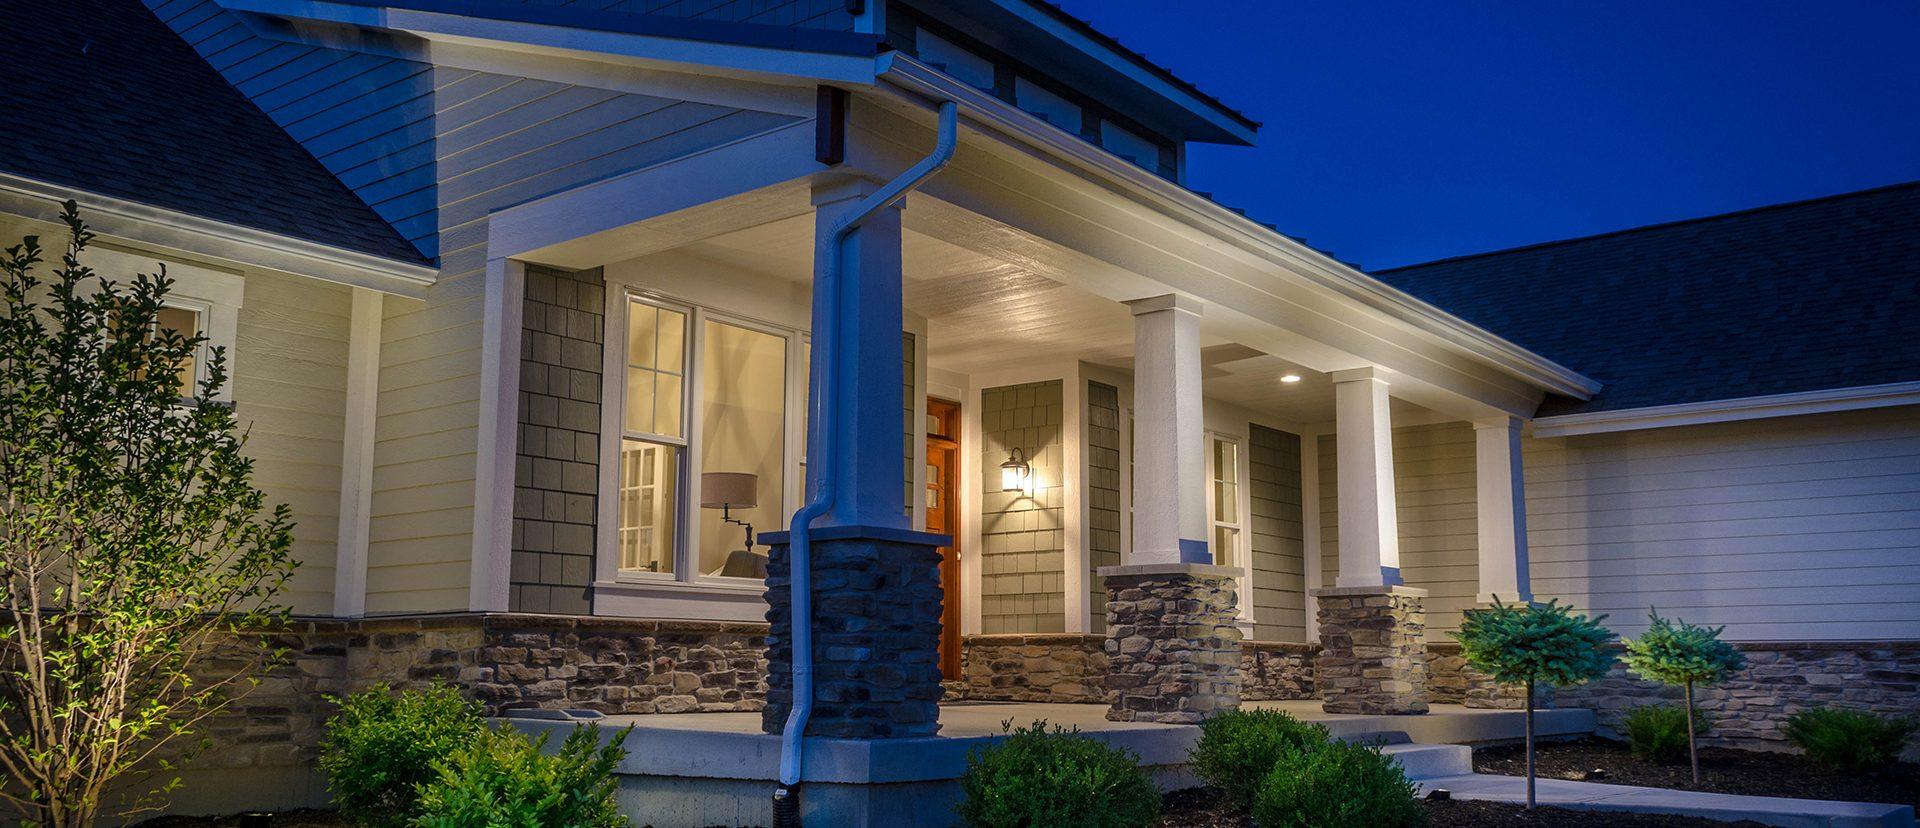 Lighting for your Custom Home